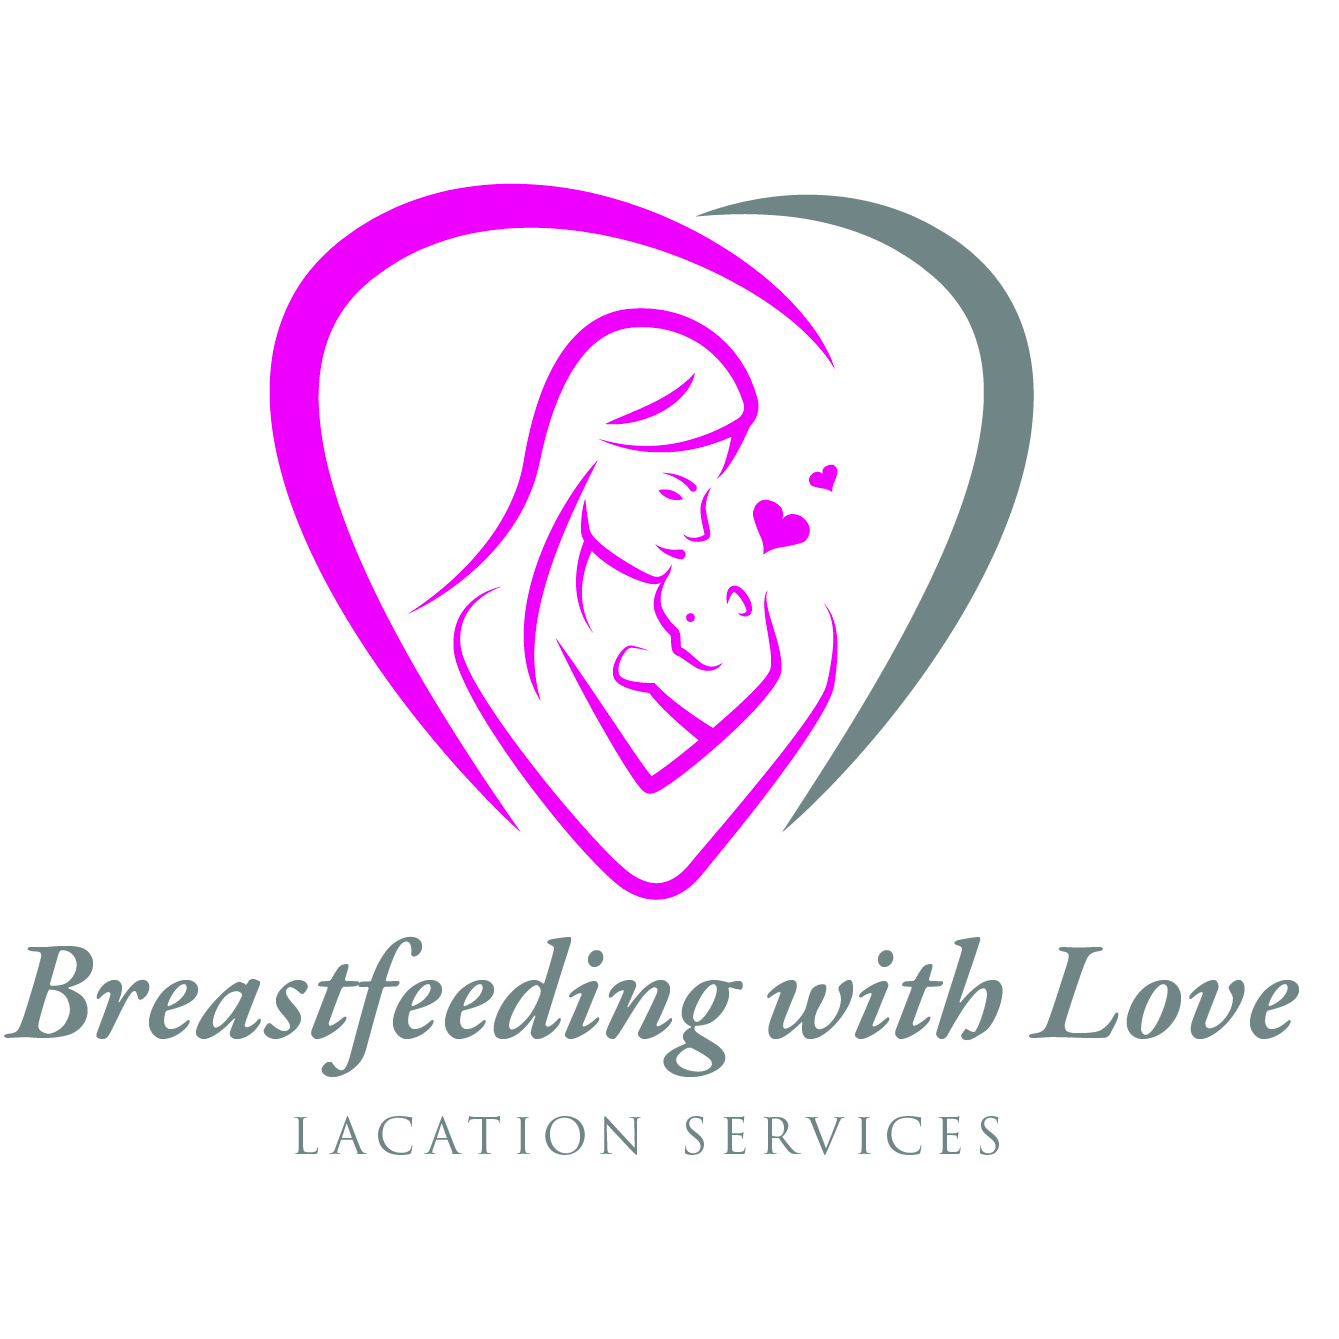 Lactation Consultant BreastfeedingwithLove